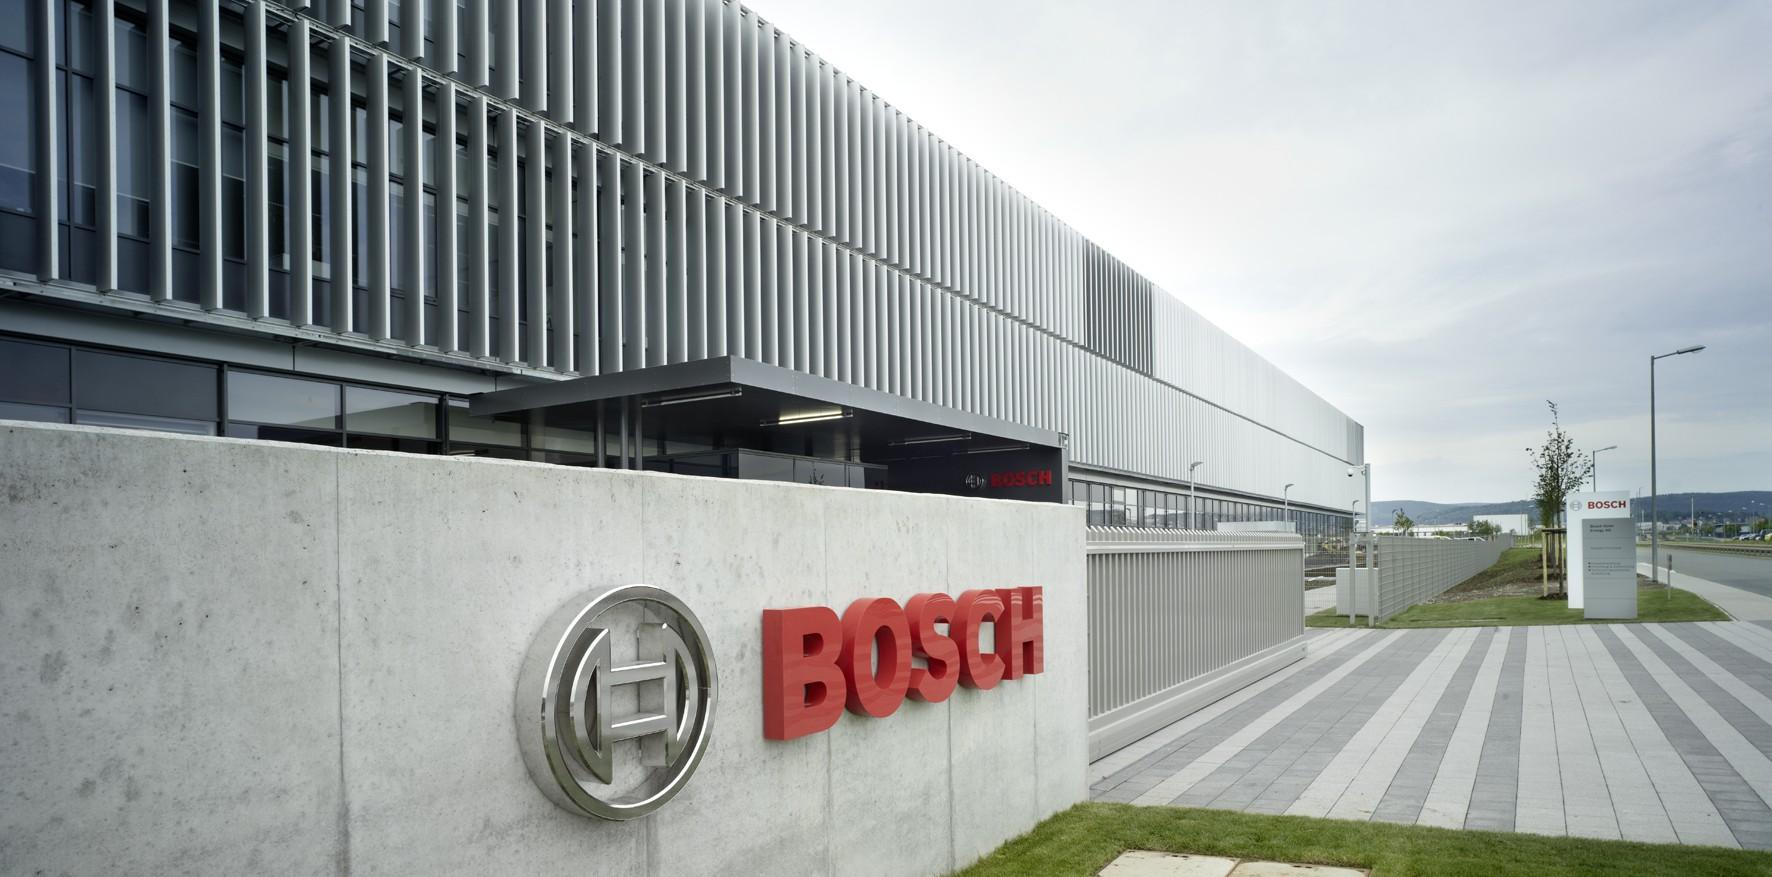 Bosch csb 500% return investment eileen fisher yarn vest